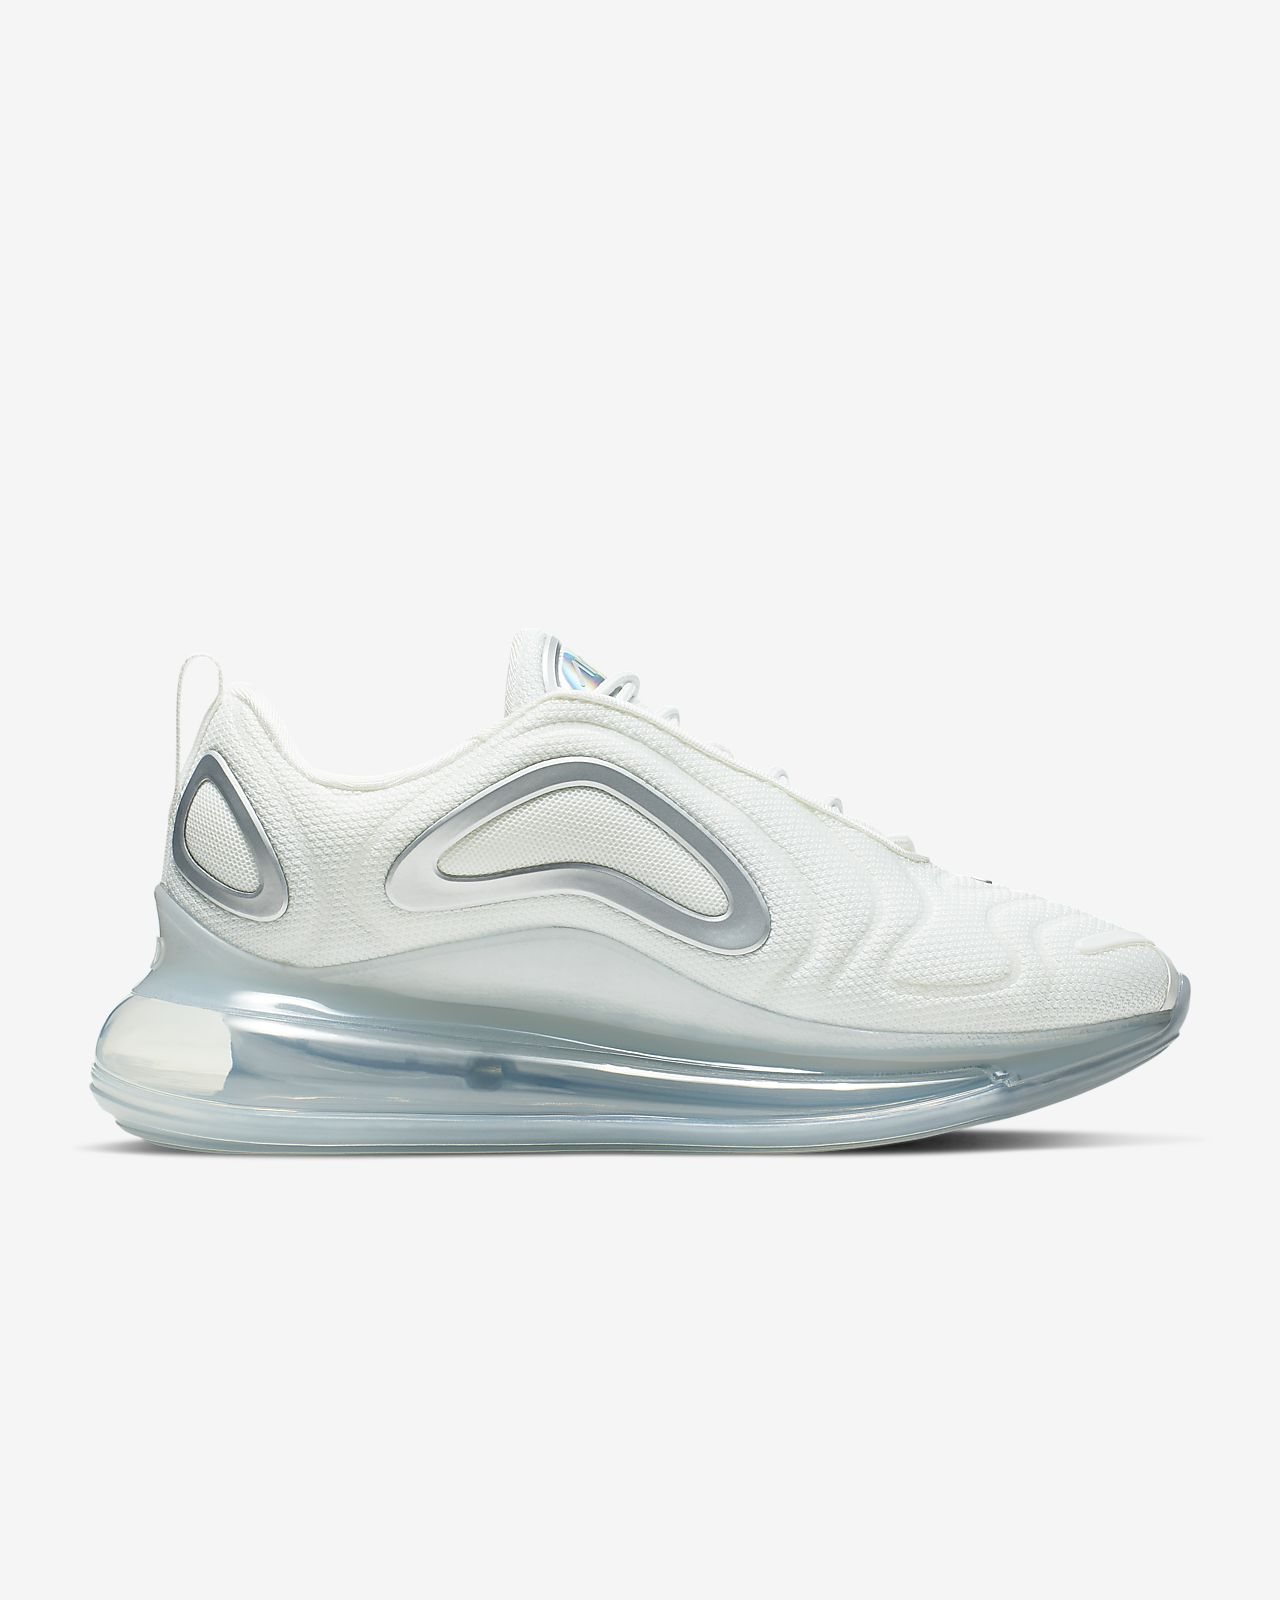 Nike Air Max 720 Women's Iridescent Shoe